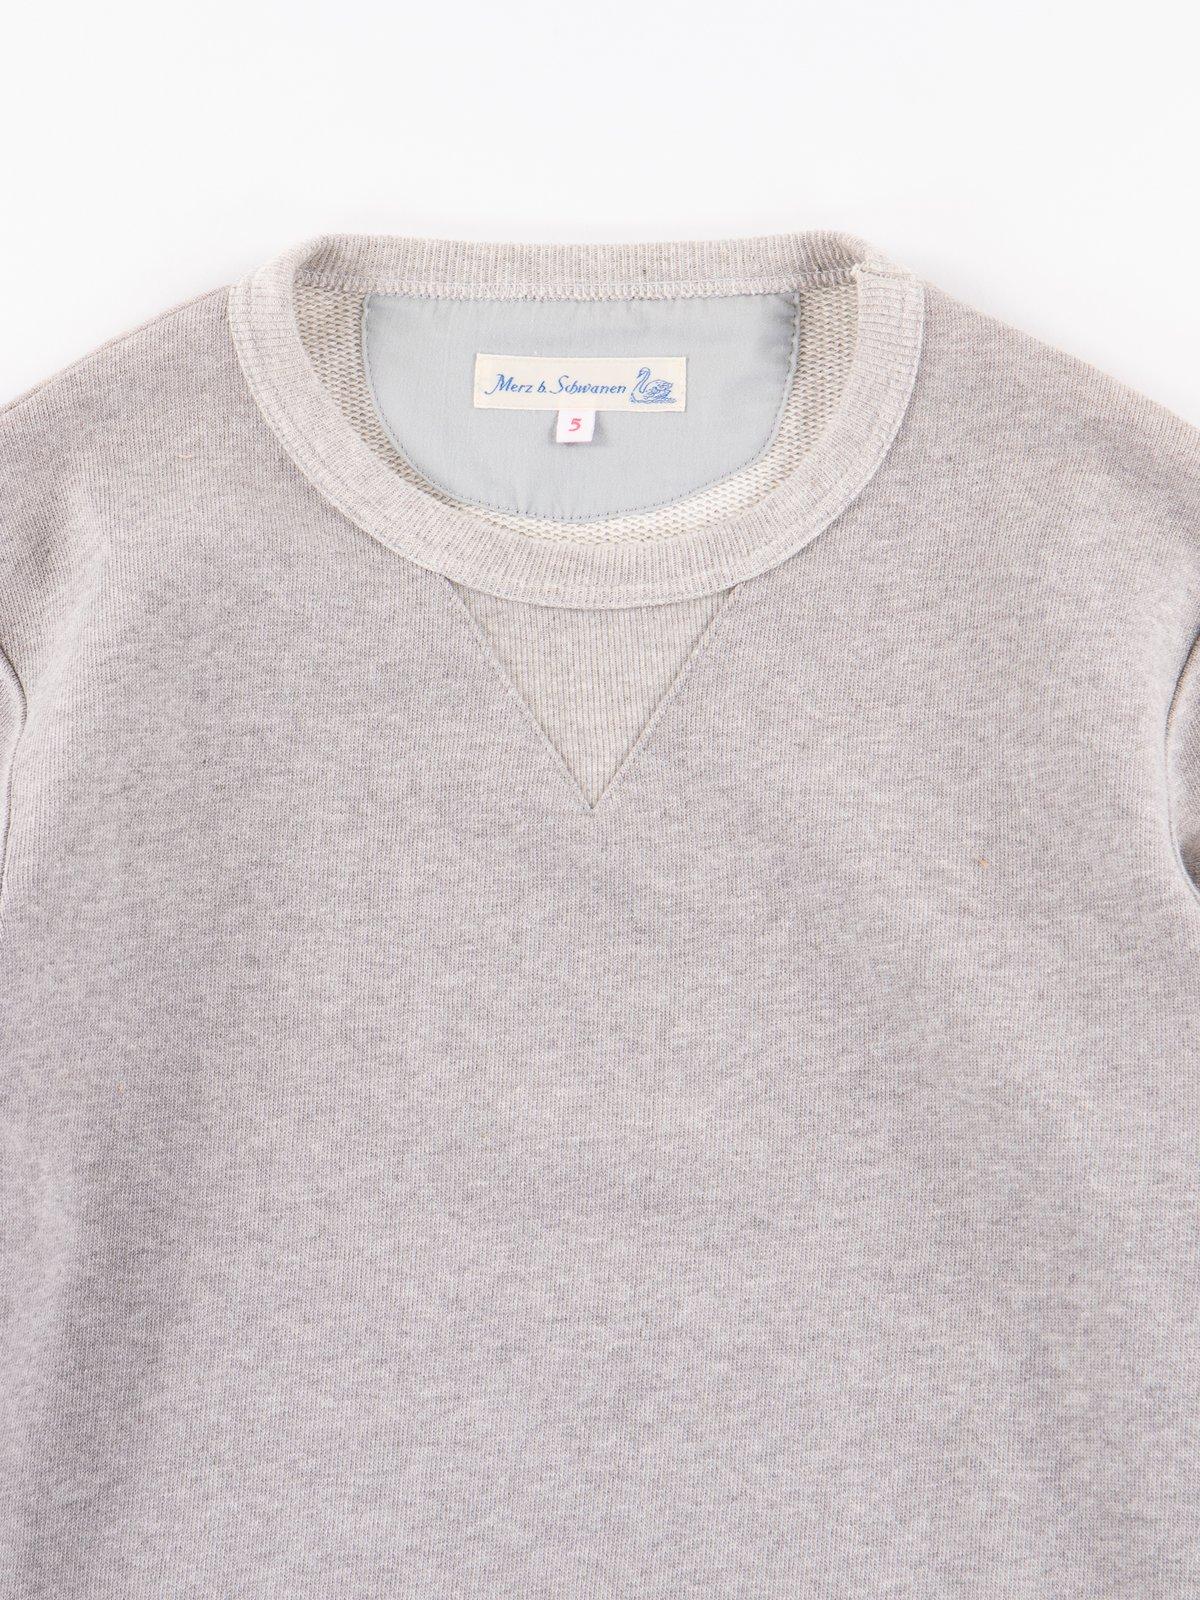 Grey Melange 3S48 Organic Cotton Heavy Sweater - Image 2